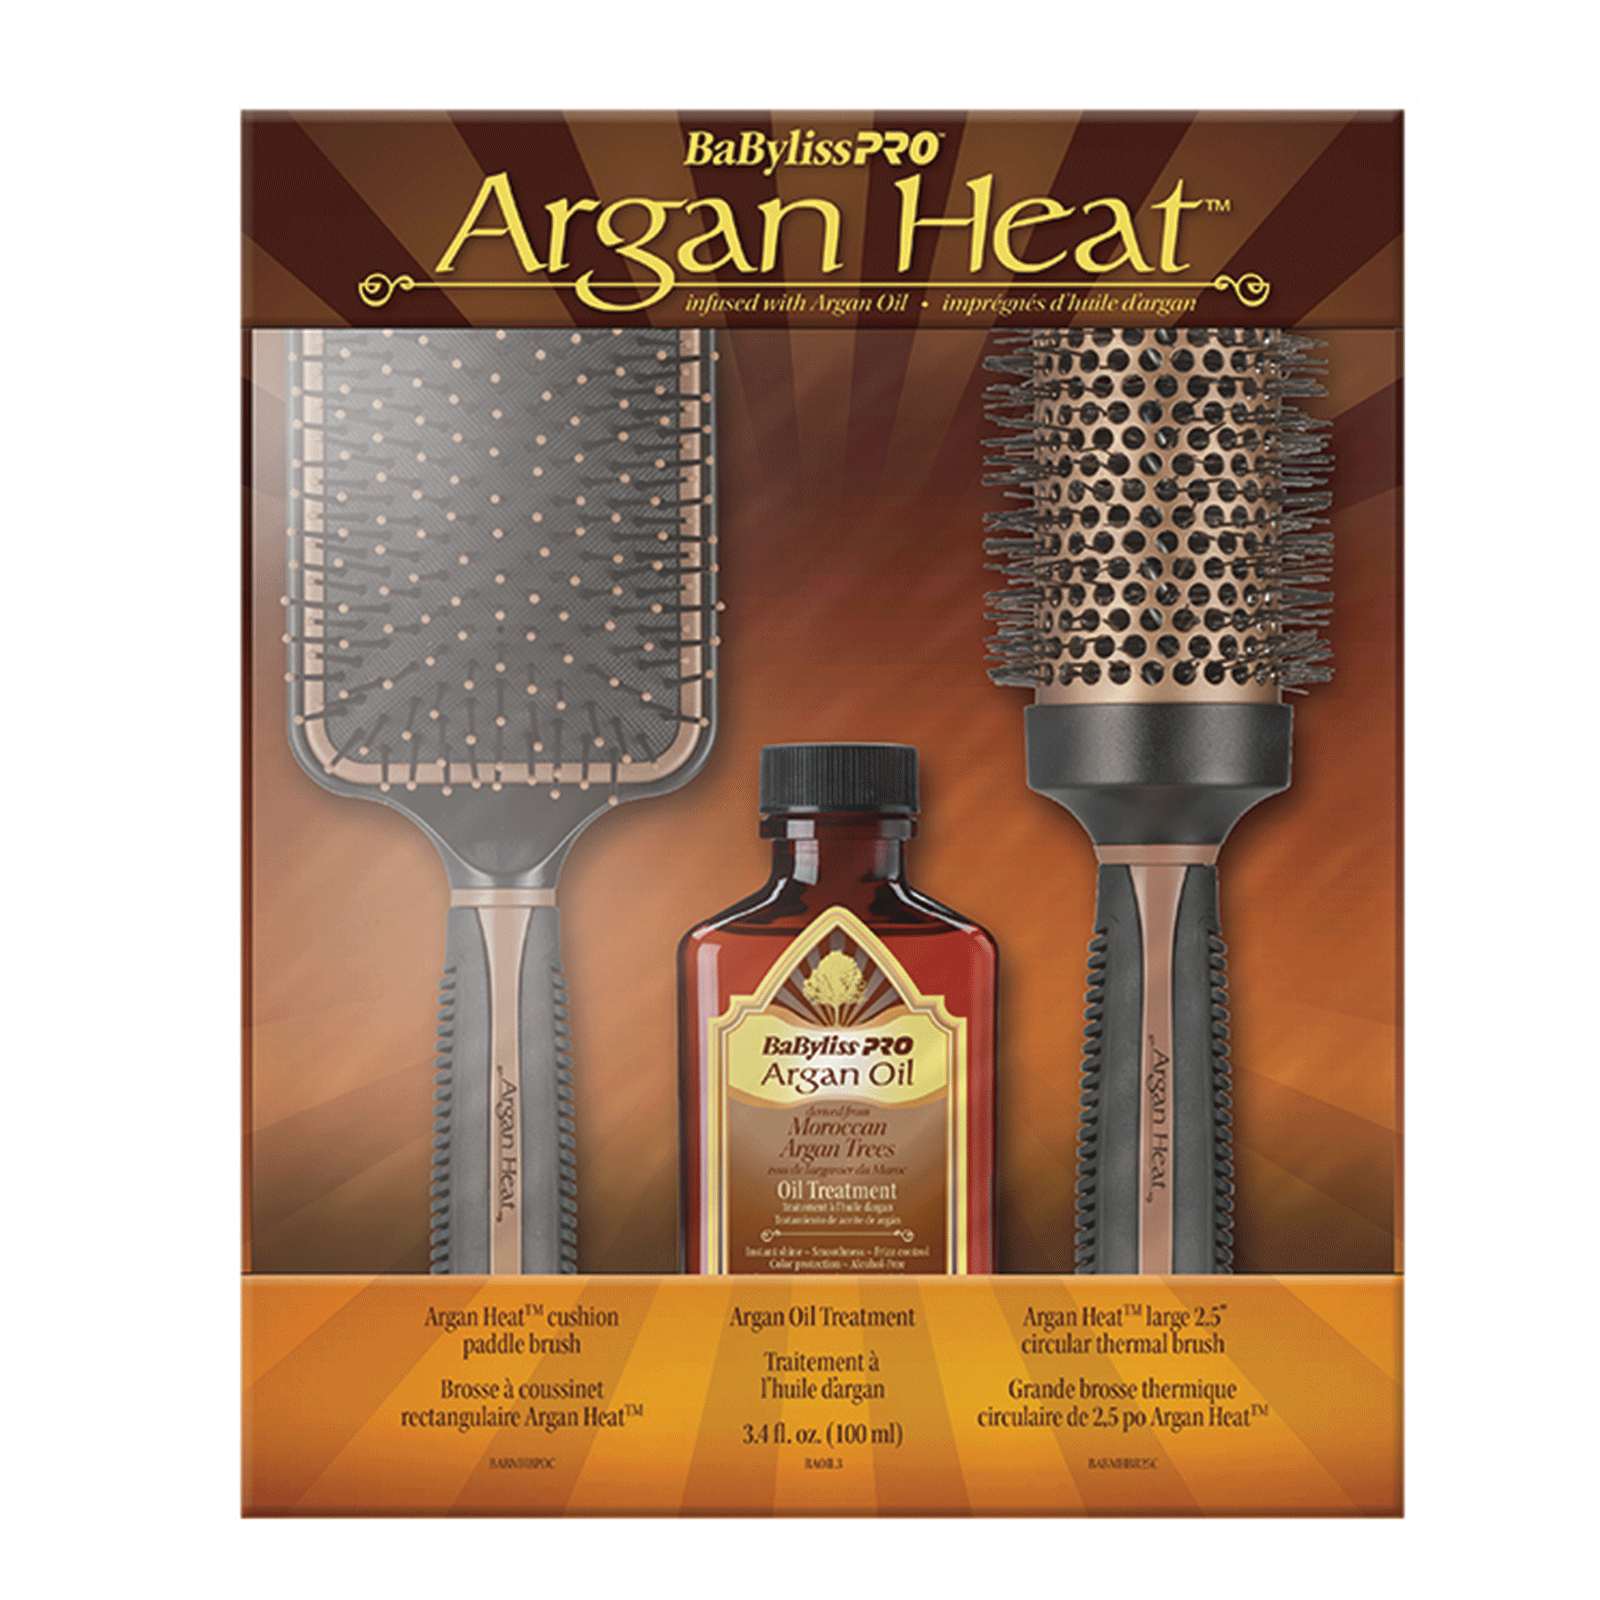 BaByliss Pro Argan Heat Paddle Brush, Thermal Brush & Oil Set